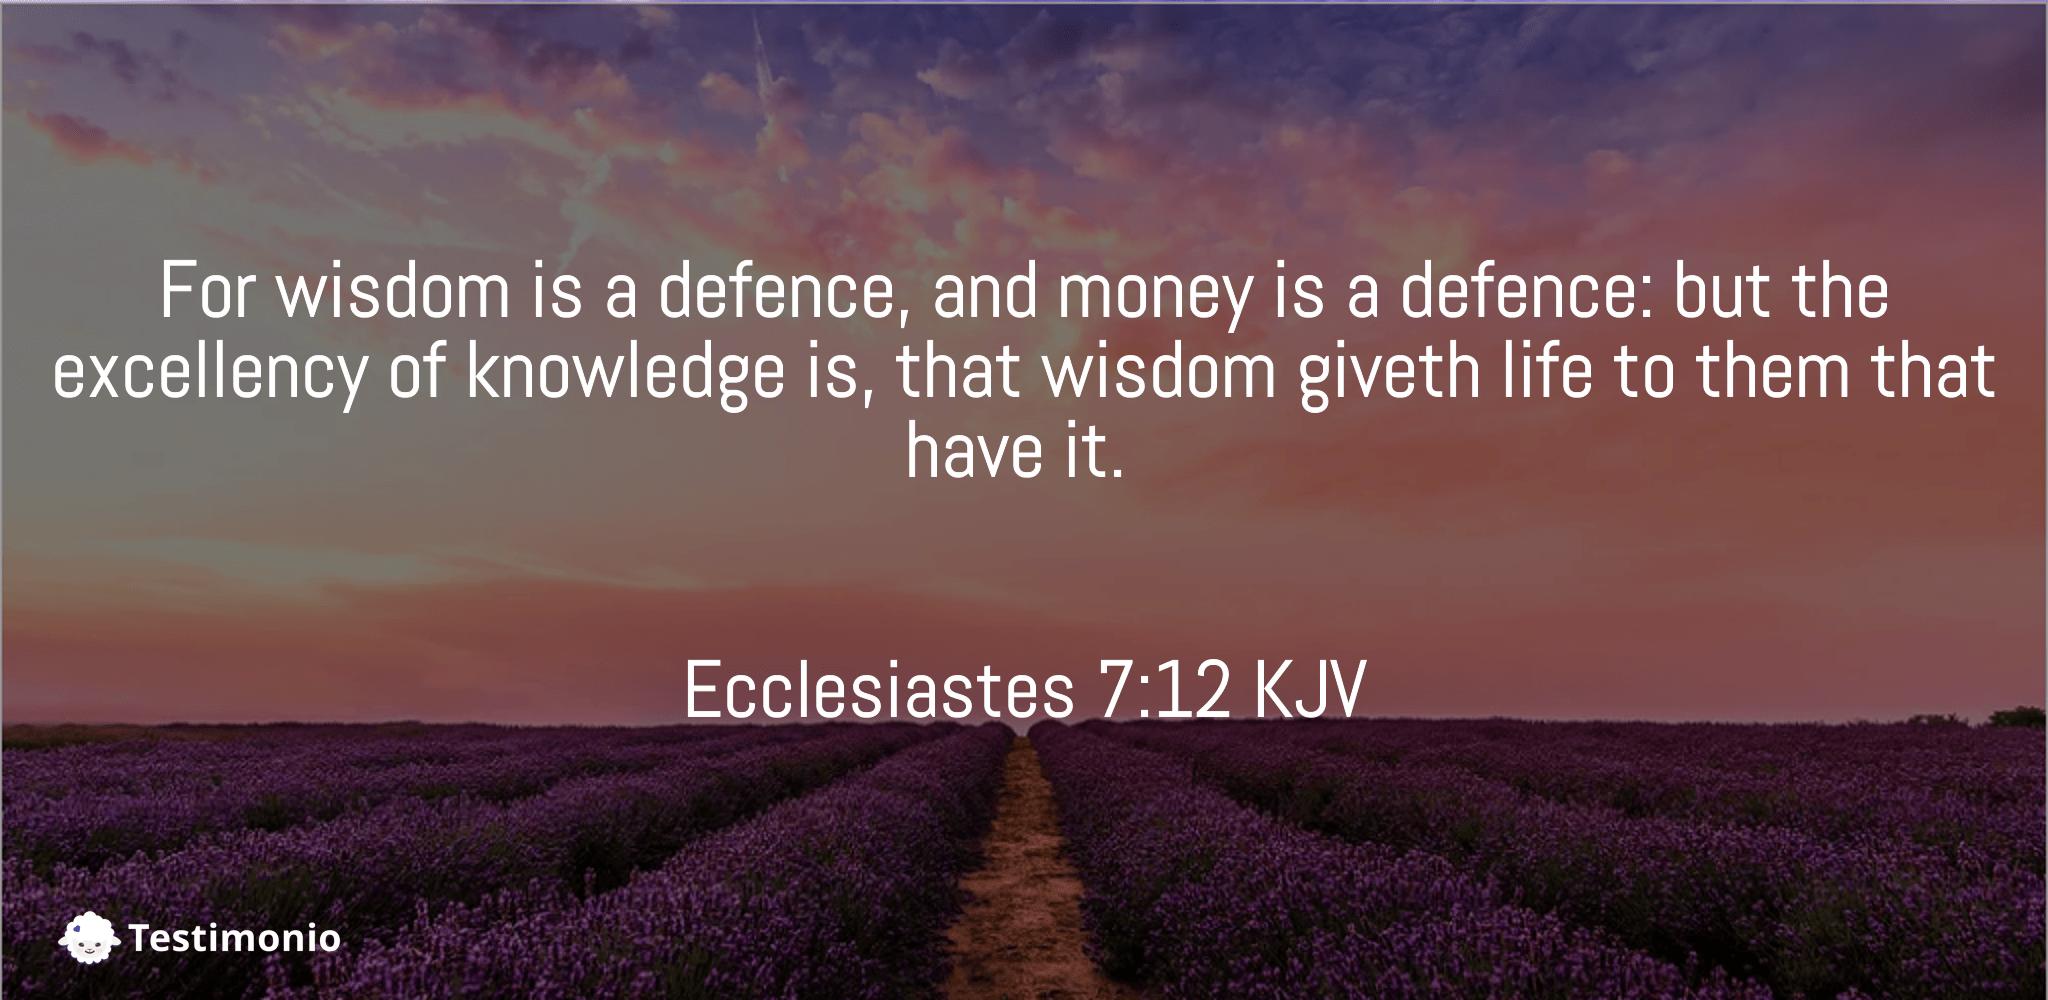 Ecclesiastes 7:12